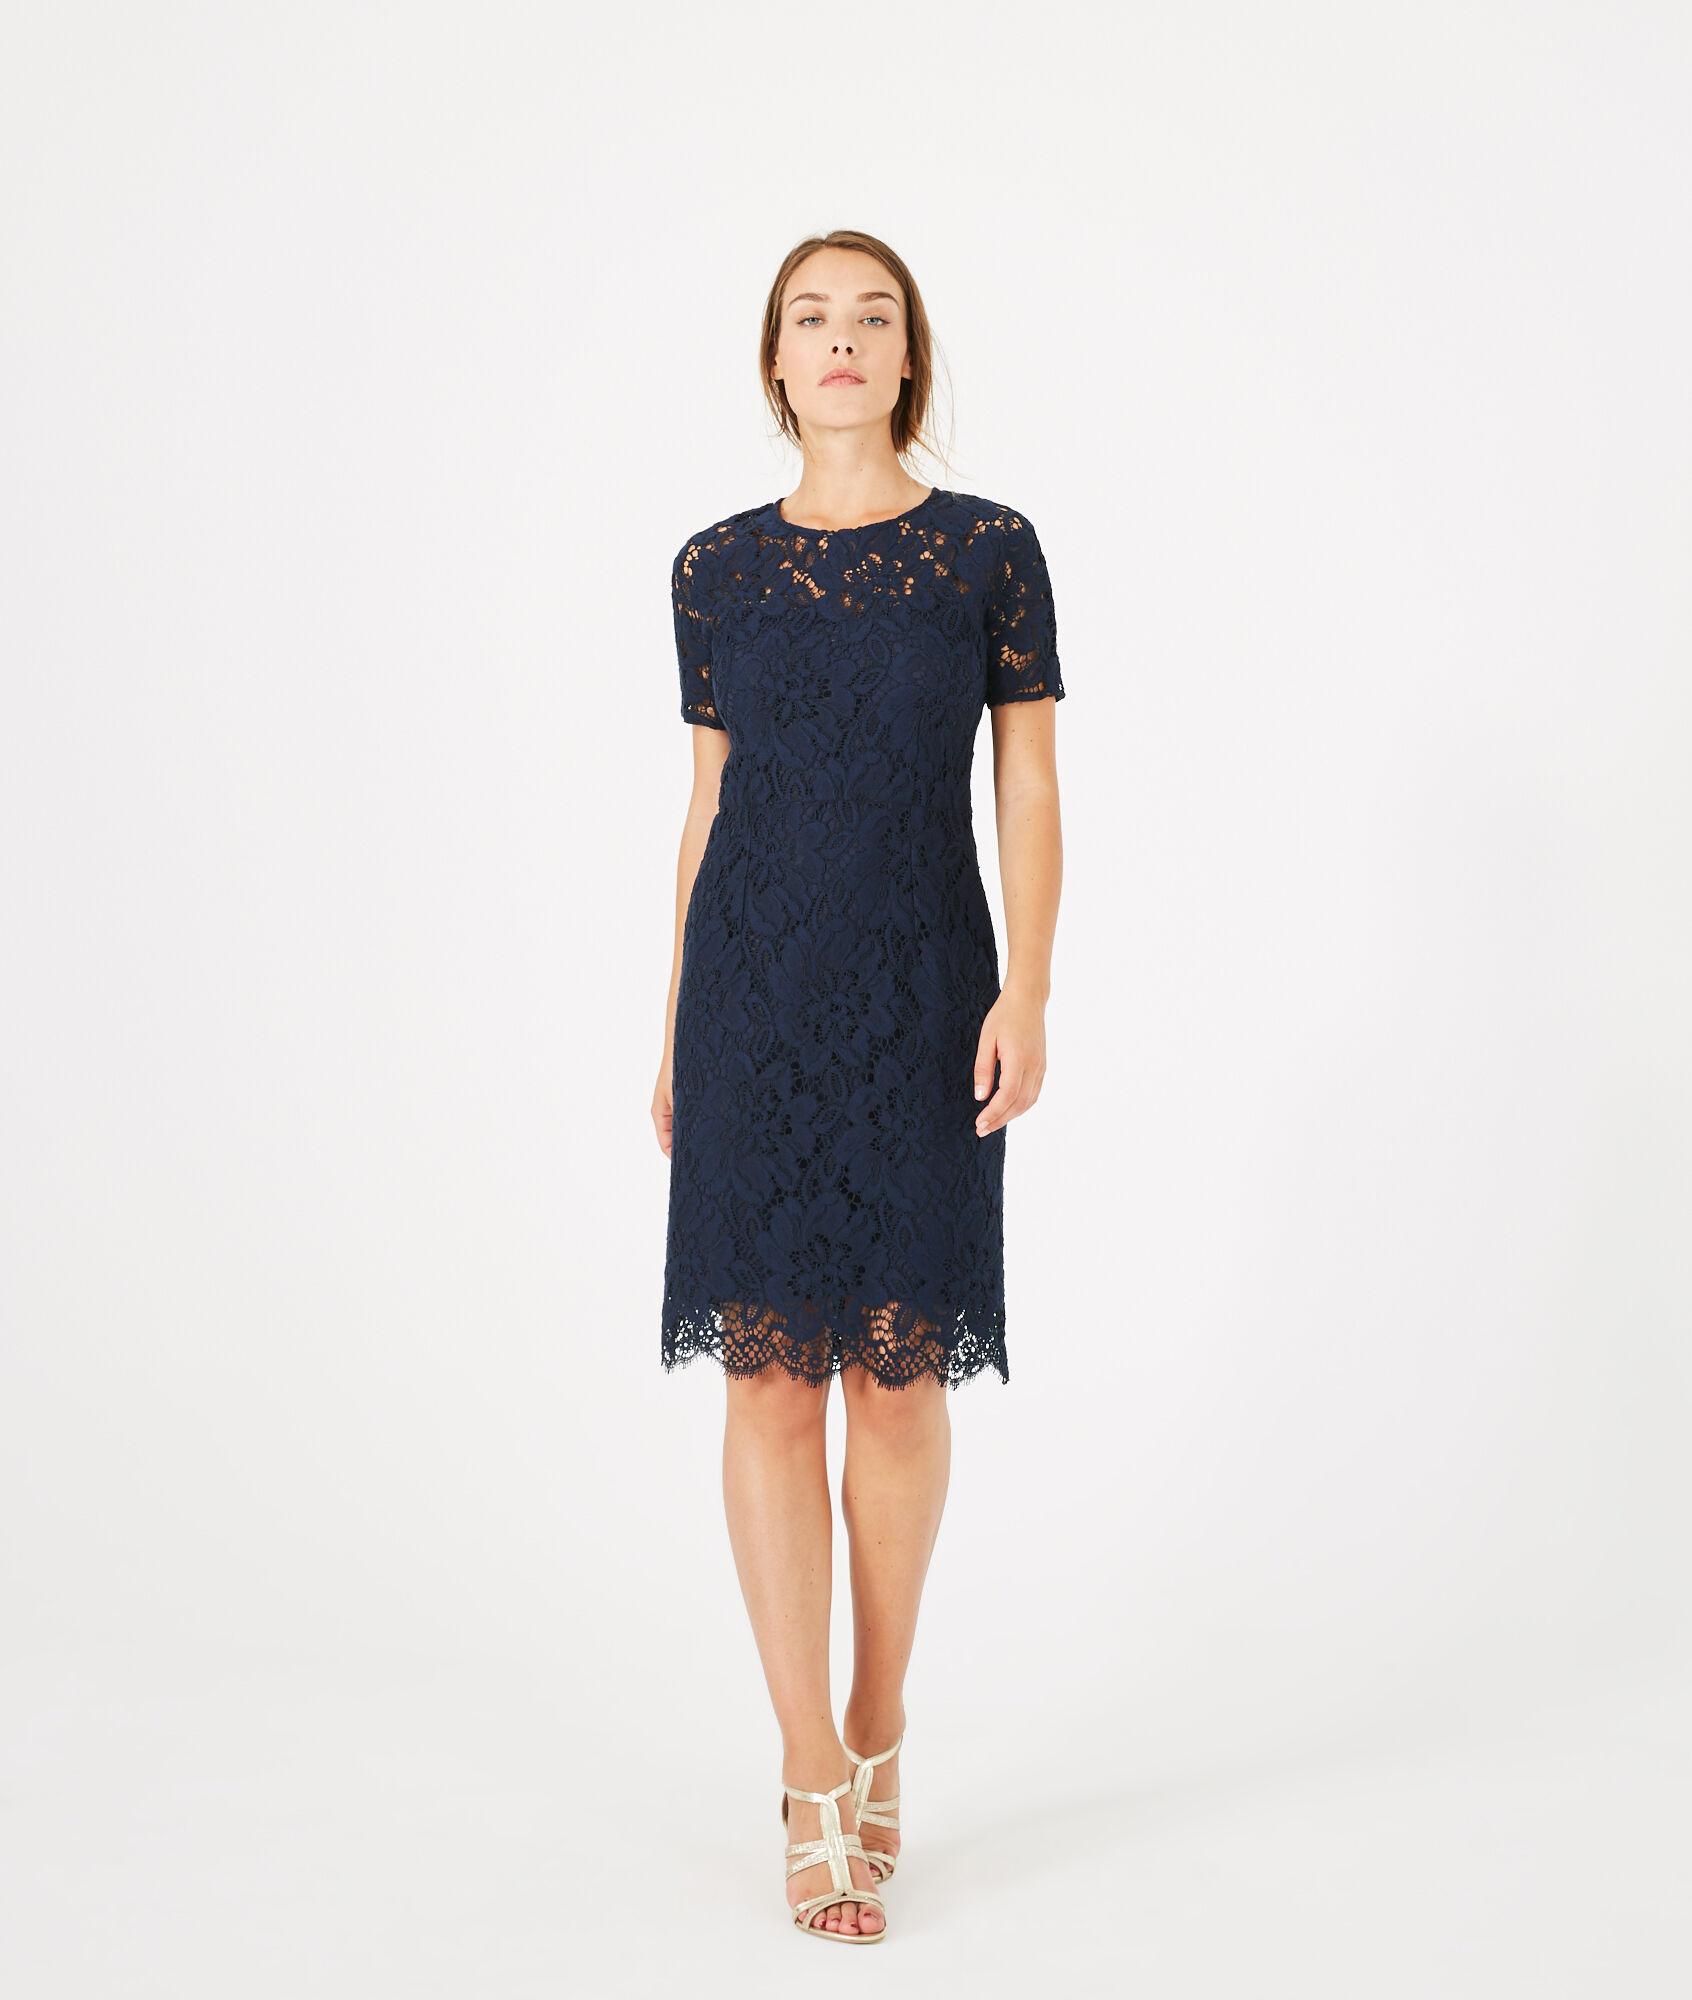 Robe bleue 123